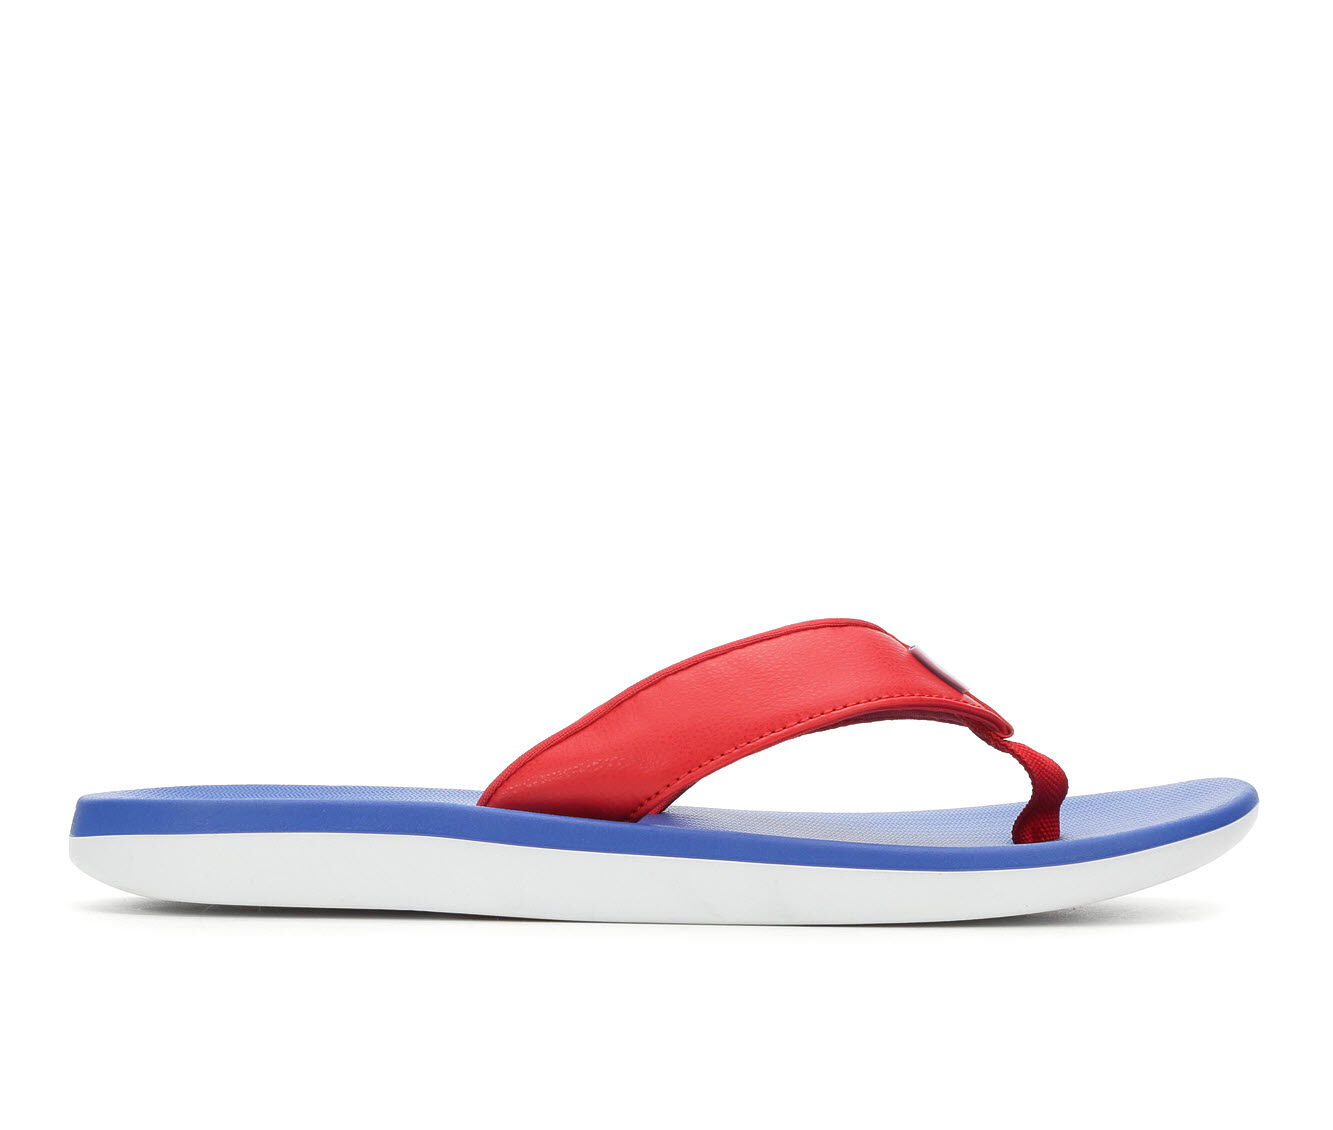 Men's Nike Kepa Kai Flip-Flops Red/RoylBlu/Wht